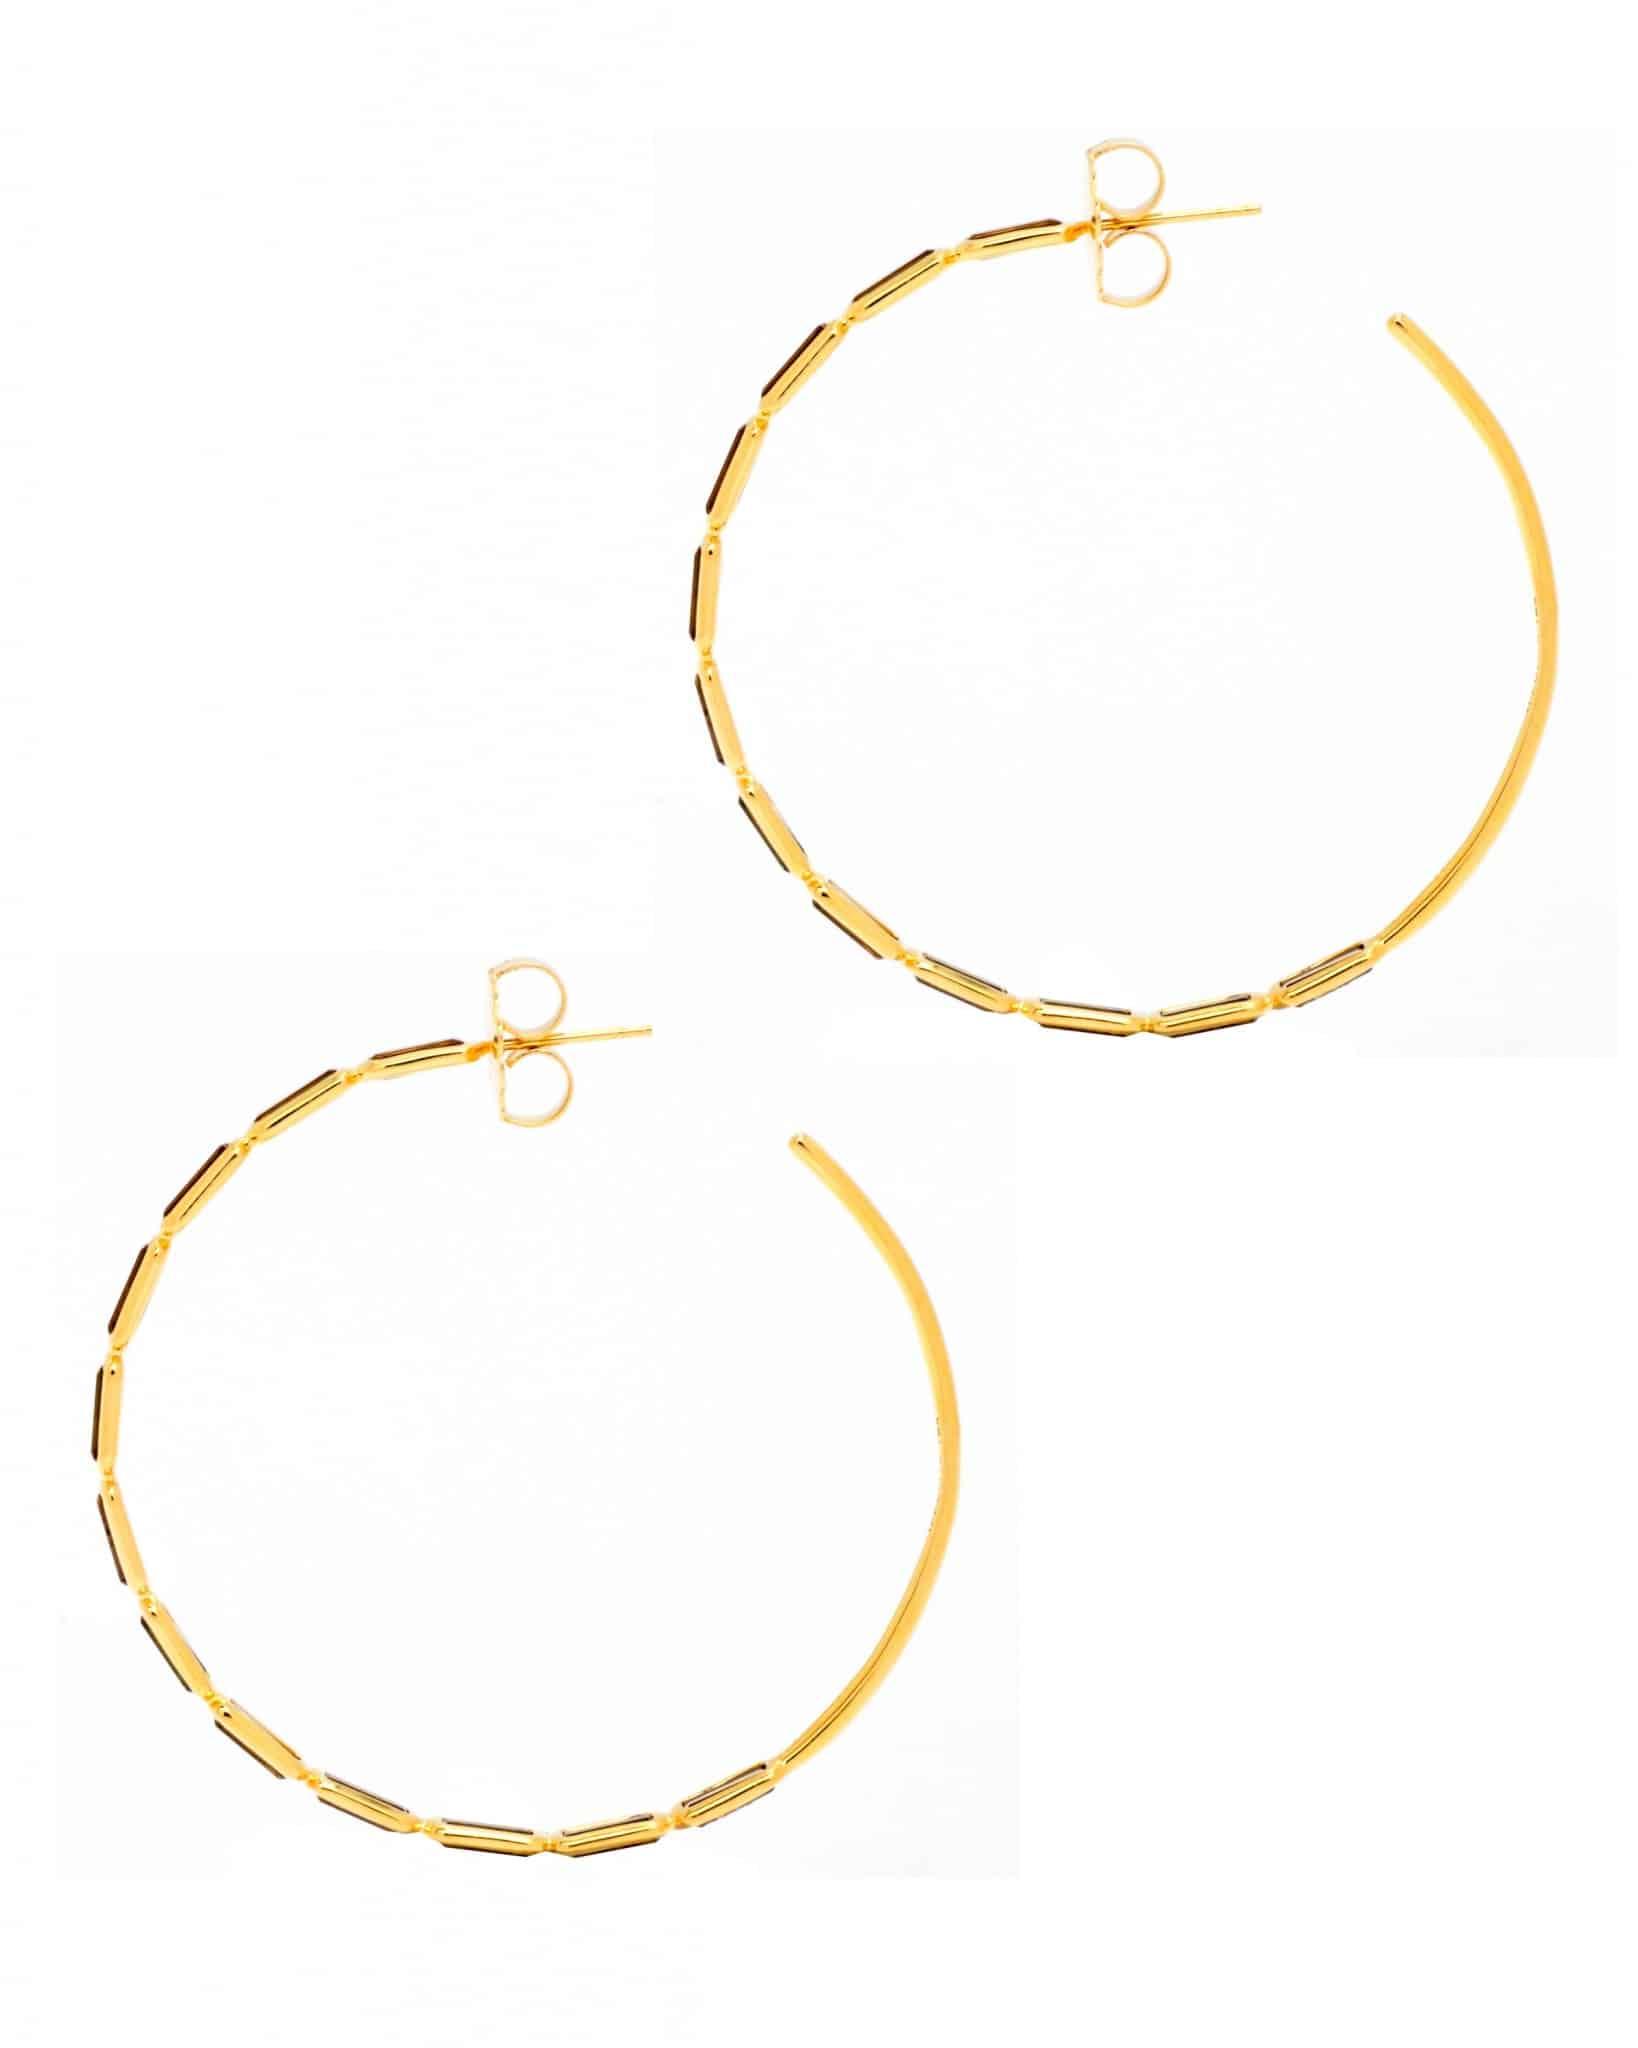 IPPOLITA 18K Gold Rock Candy Gelato Rectangular Stone Hoop Earrings GE1314CN